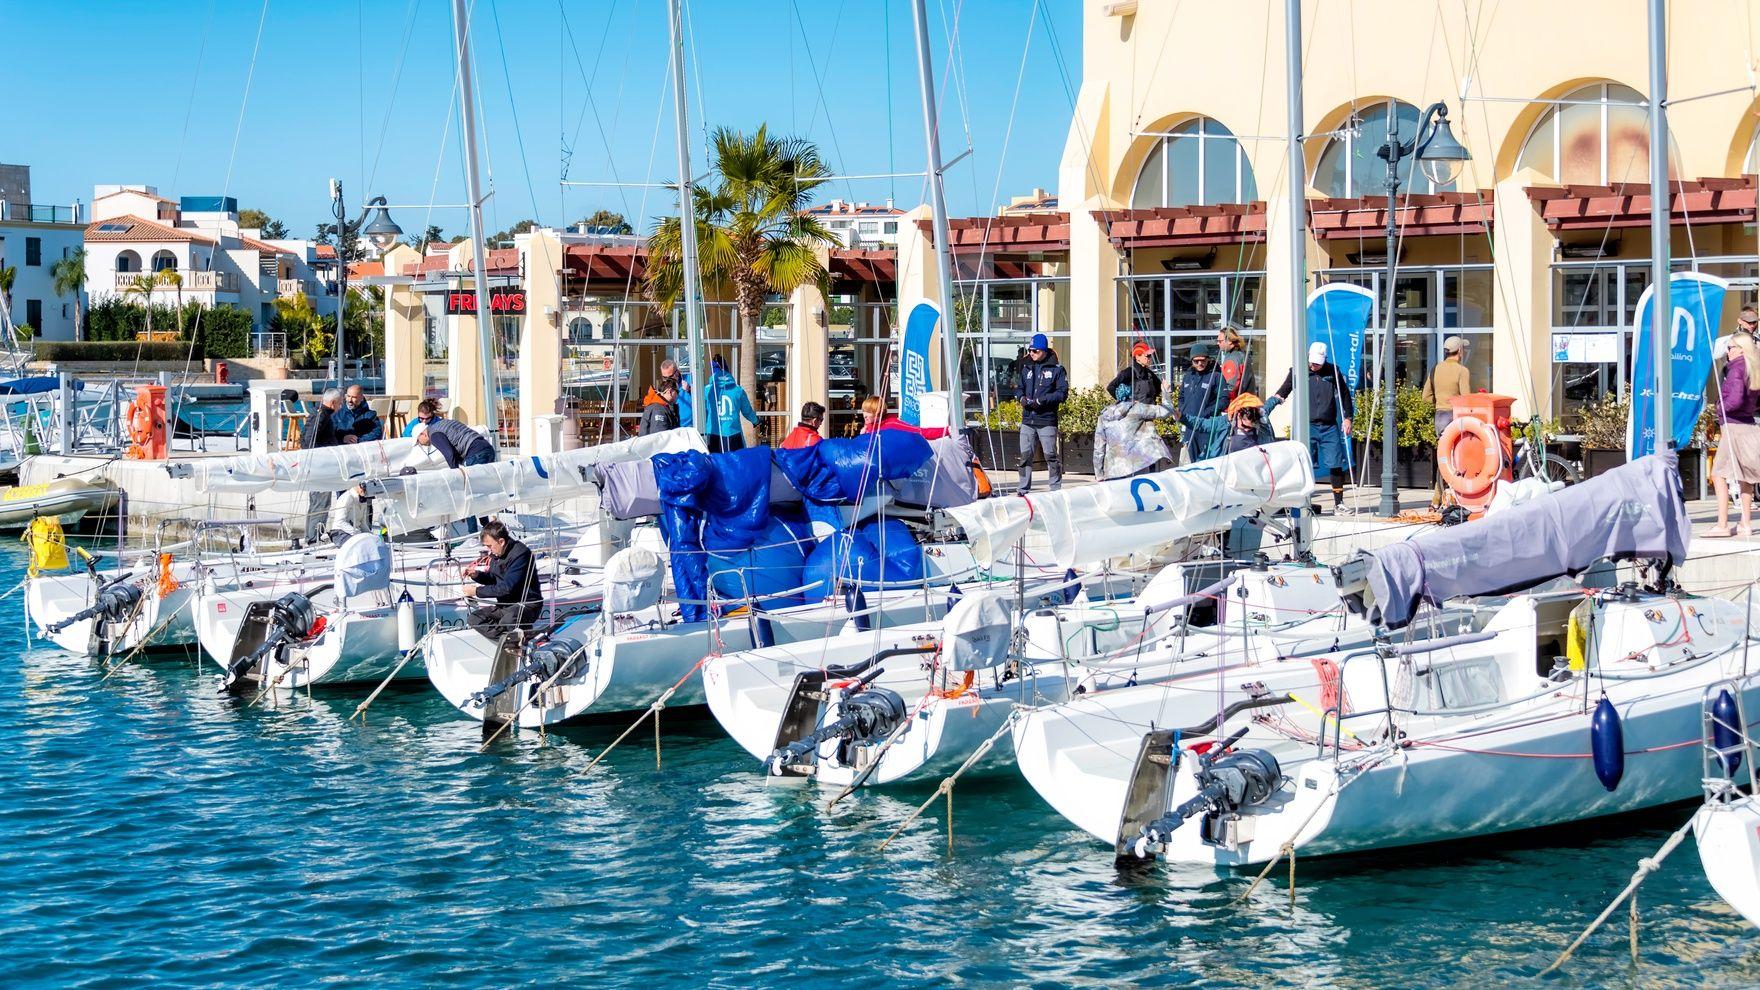 Day sailing — Fareast 28R